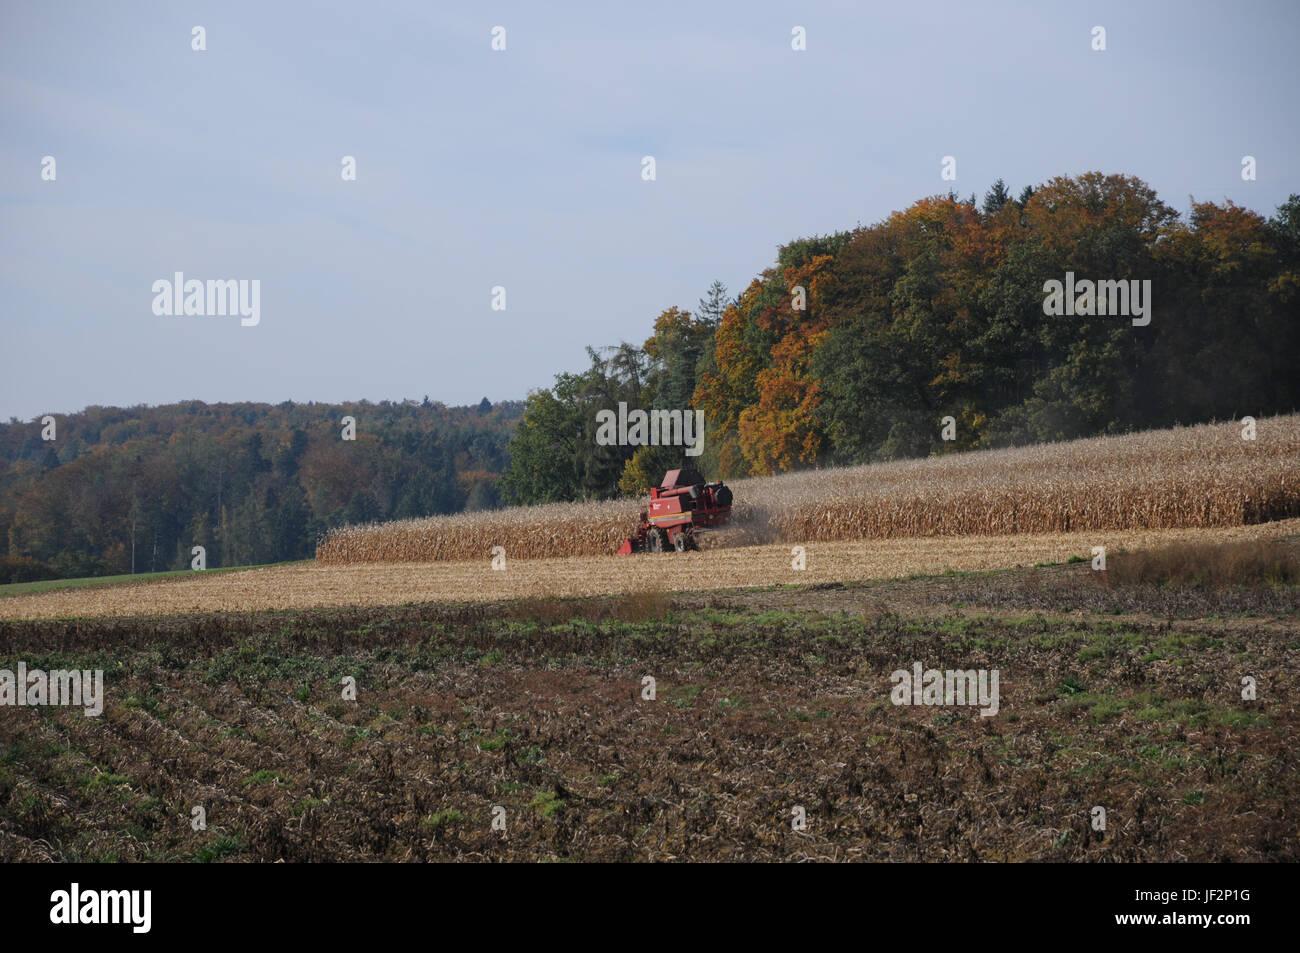 Zea mays, Maize, Harvest - Stock Image